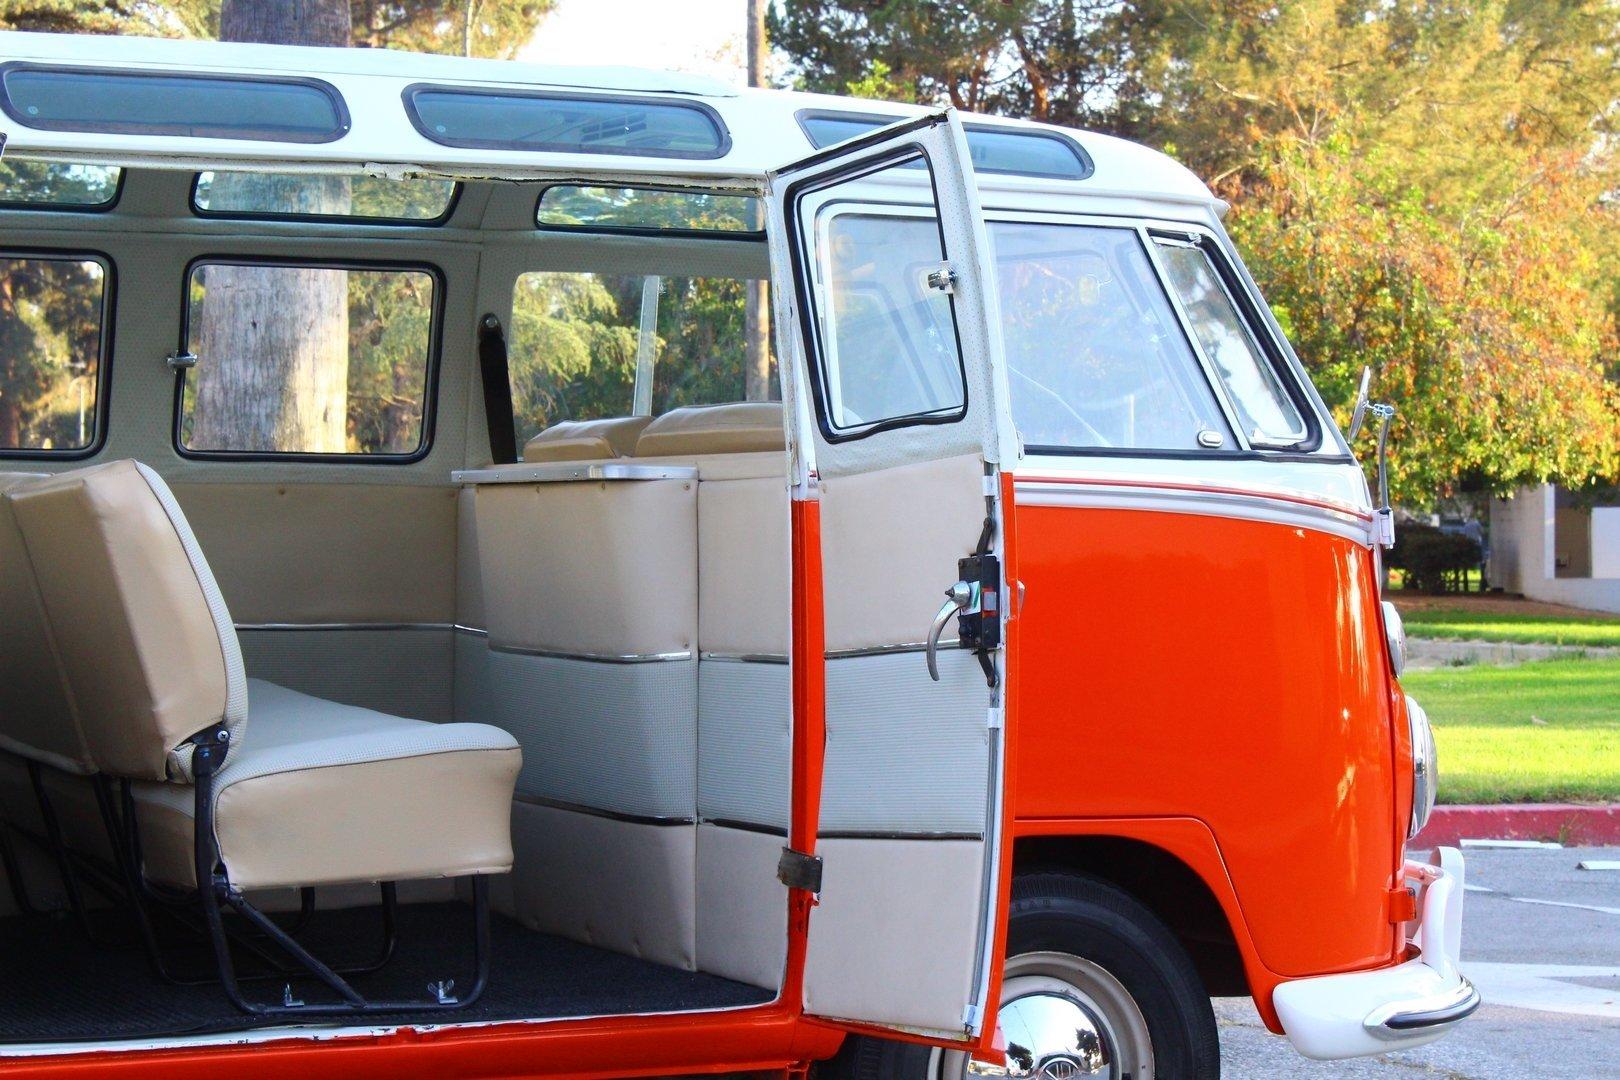 1963 Volkswagen Type 2 (T1) Sunroof Deluxe/Samba Microbus for sale #95220 | MCG